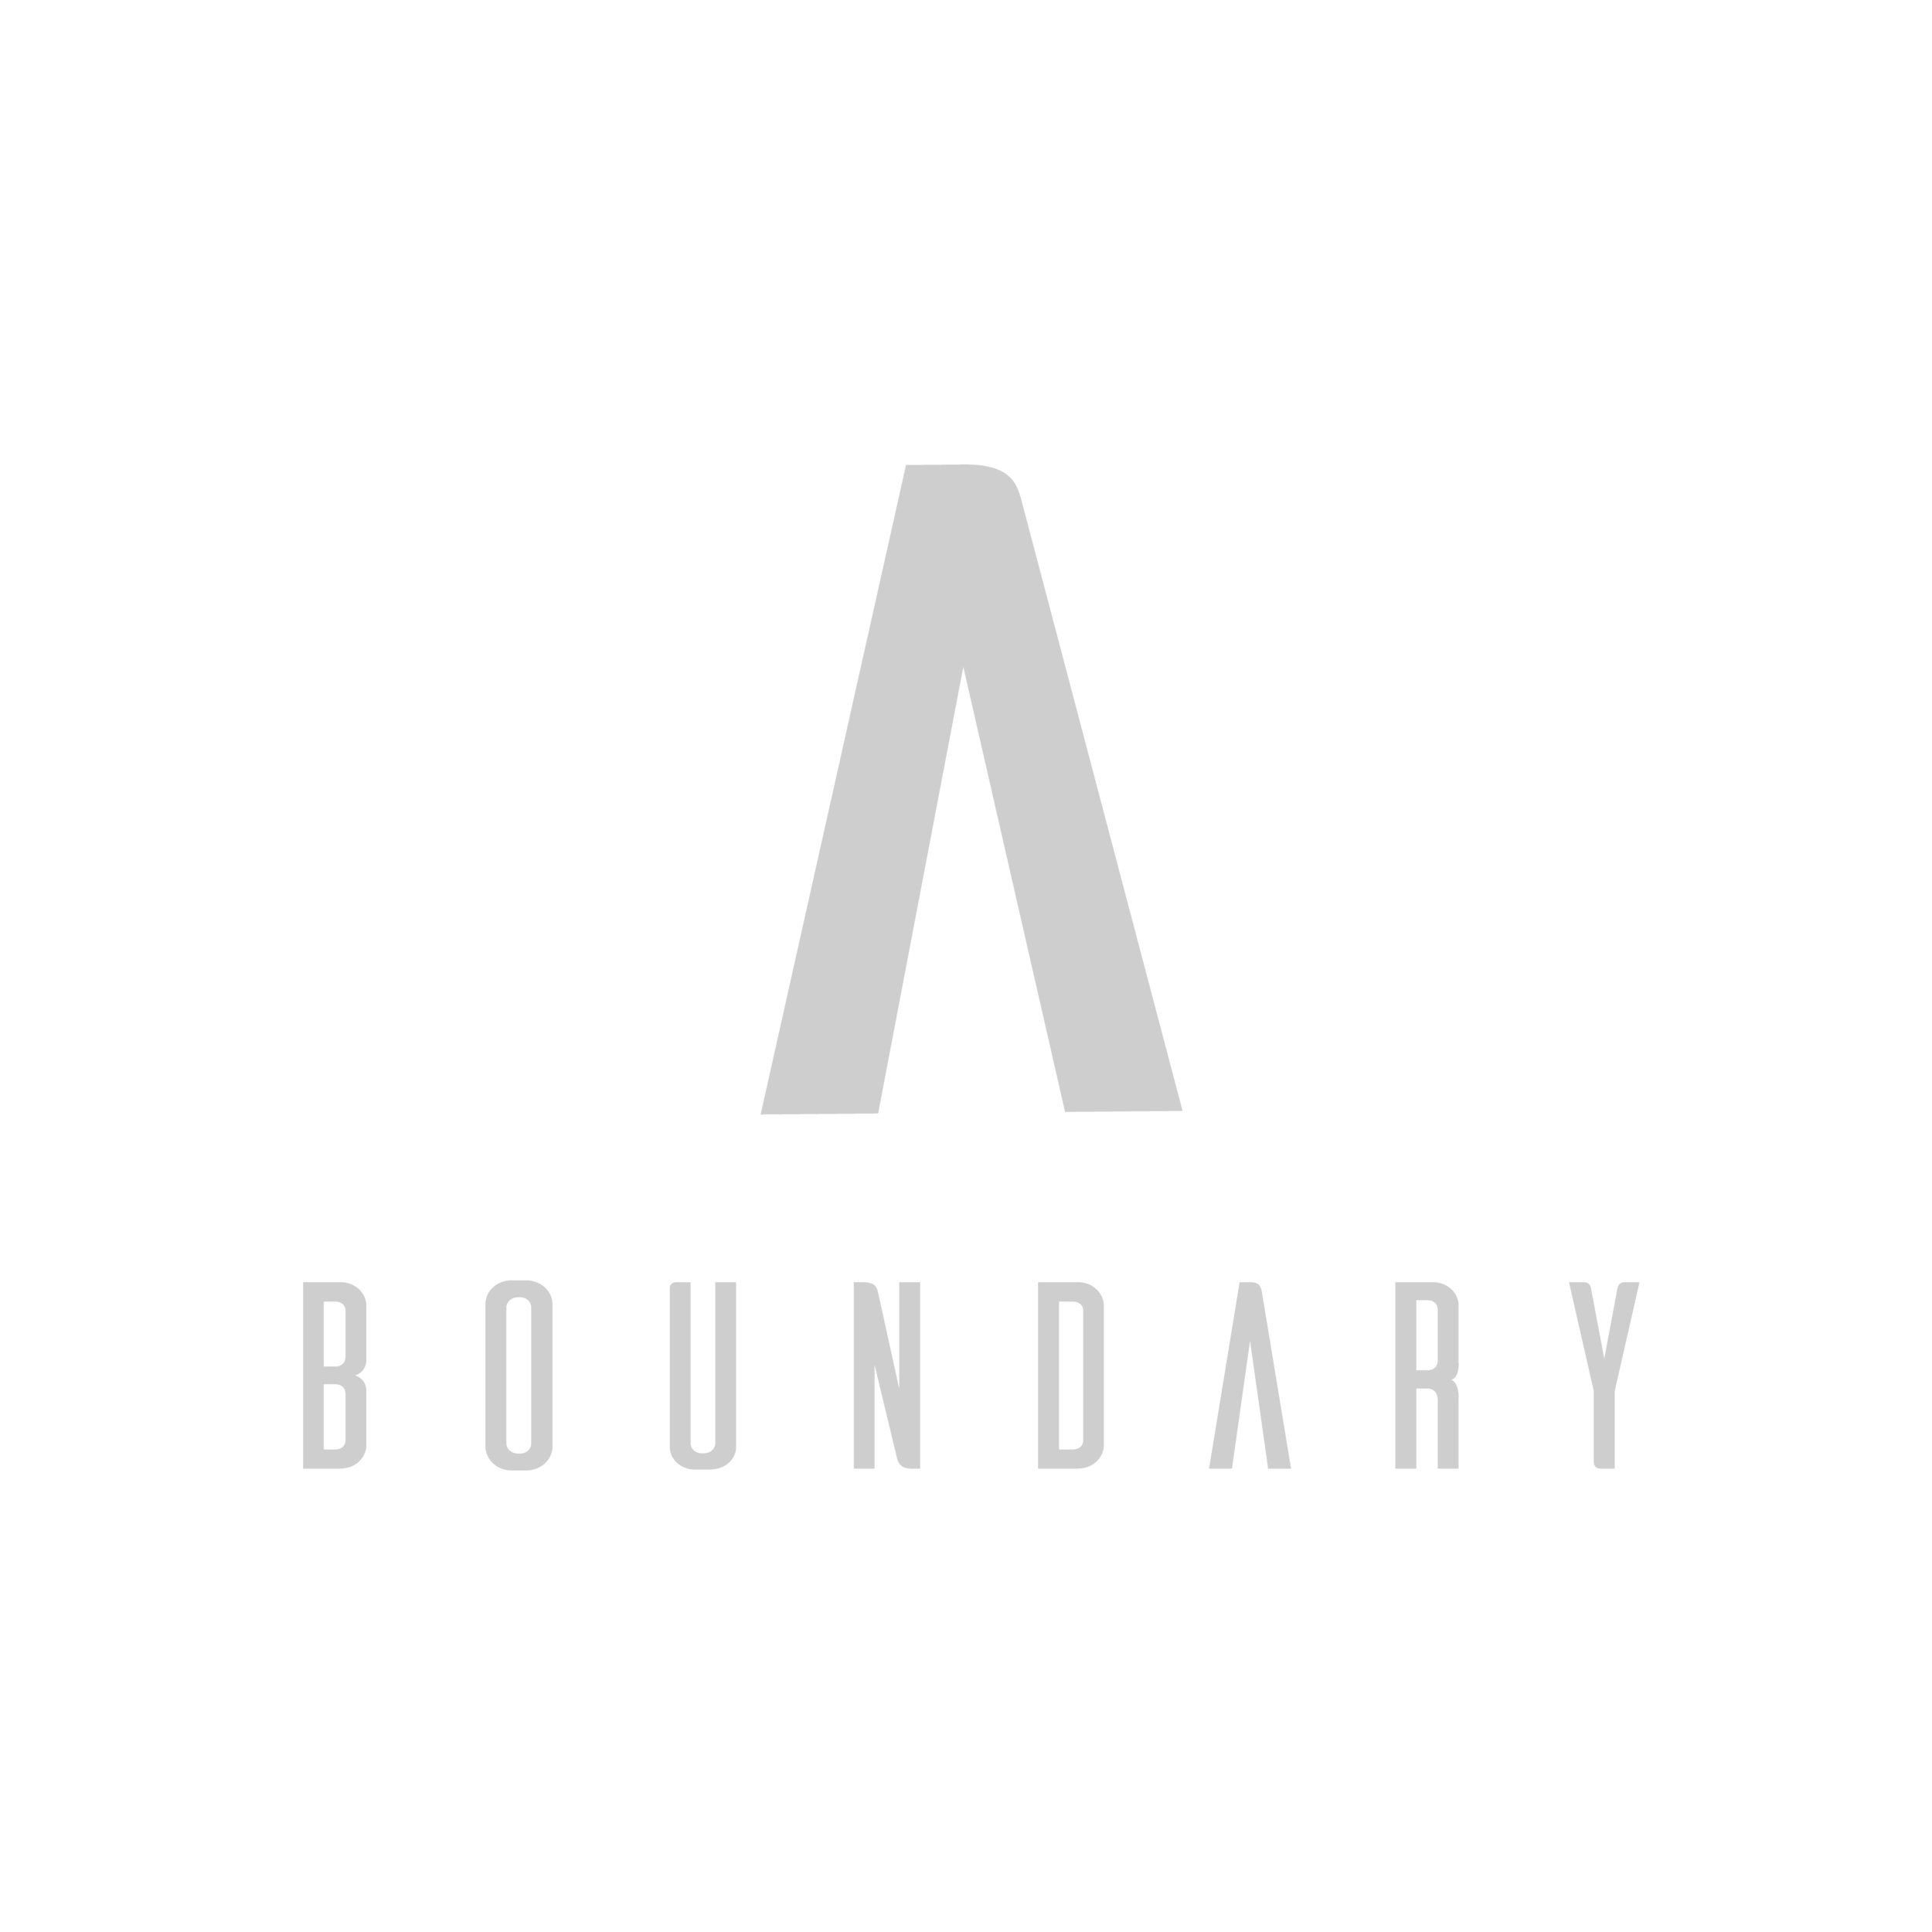 Boundary_Logo.png